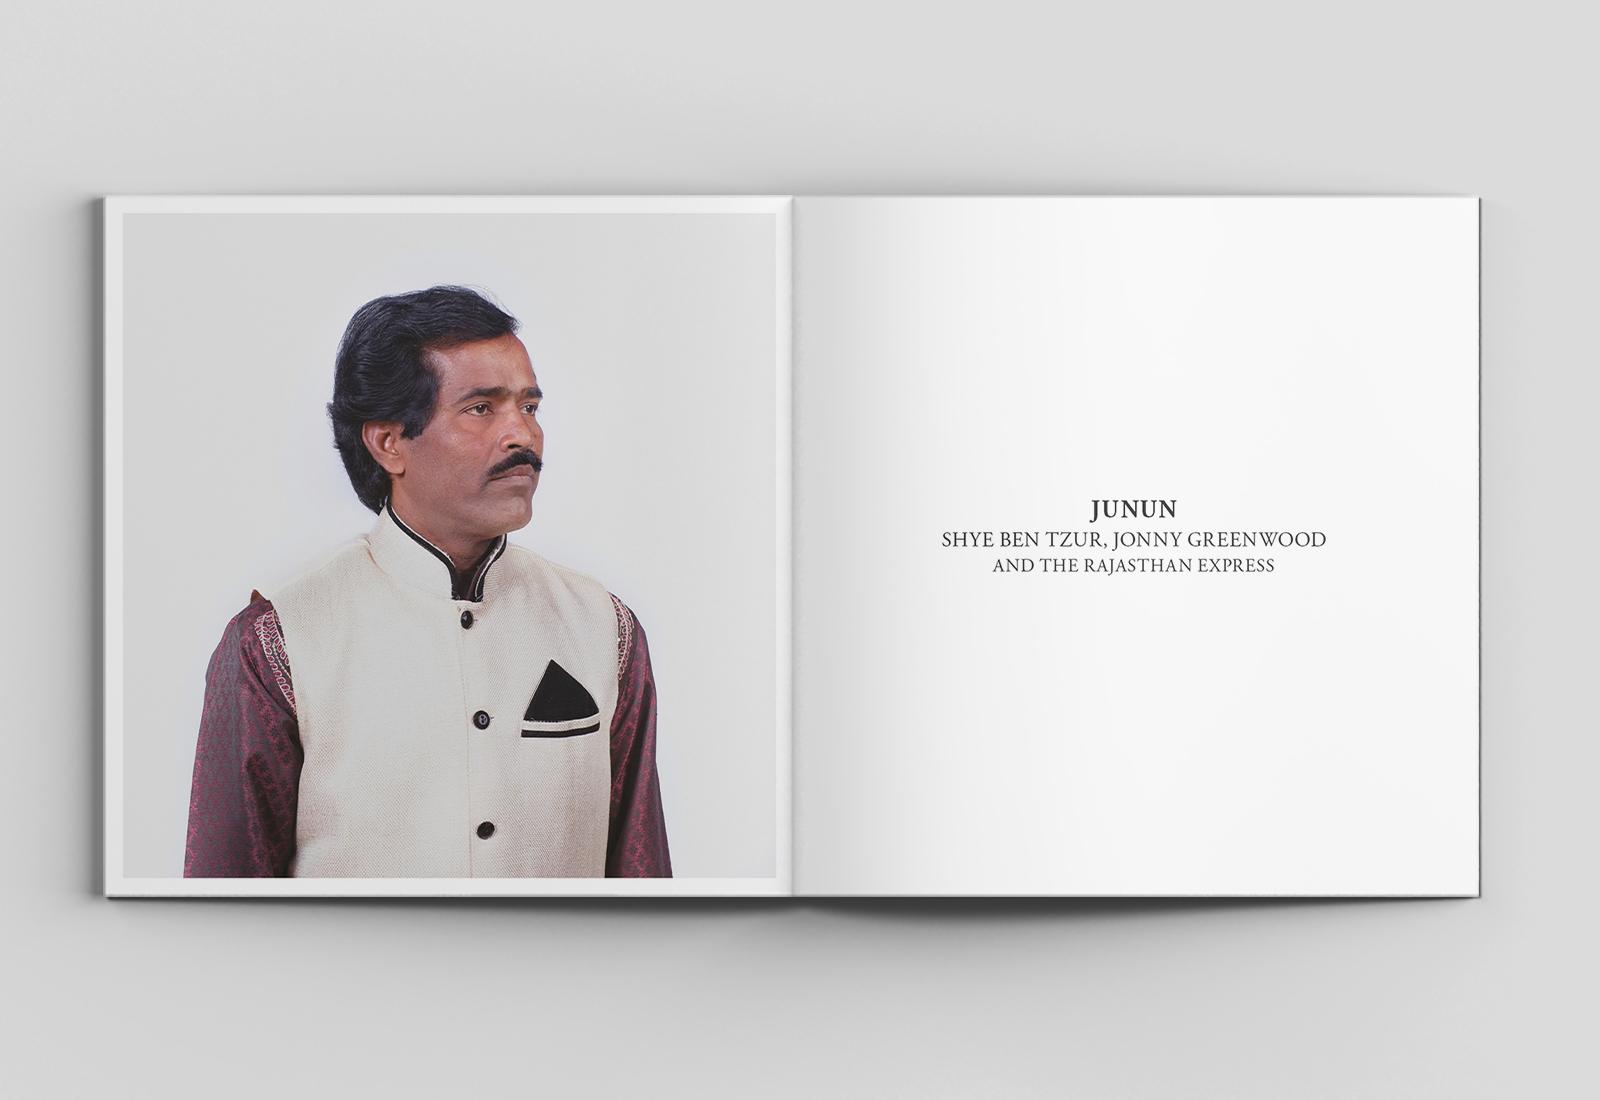 CD booklet 3